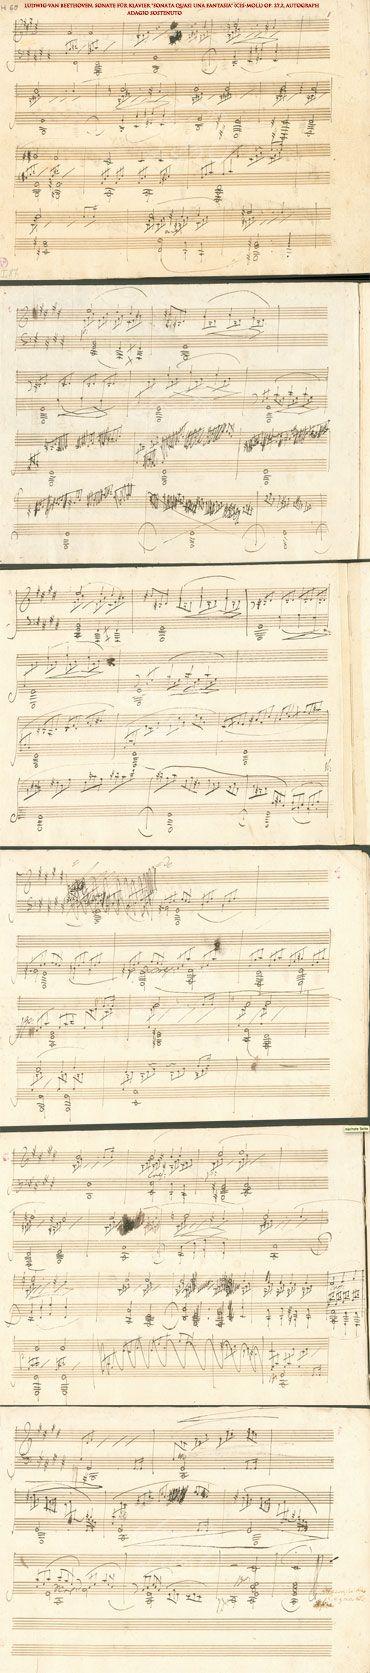 "L v Beethoven, Sonate für Klavier ""Sonata quasi una Fantasia"" (cis-Moll) op. 27,2, PART 1 Adagio Sostenuto; Autograph from Beethoven Haus in Bonn, Germany http://www.beethoven-haus-bonn.de/sixcms/detail.php?id=15123&template=dokseite_digitales_archiv_de&_dokid=wm20set%5Bdouble%5D=0&set%5Bmets%5D=http%3A%2F%2Fwww.beethoven-haus-bonn.de%2Fmods%2F00003292.mods.xml"